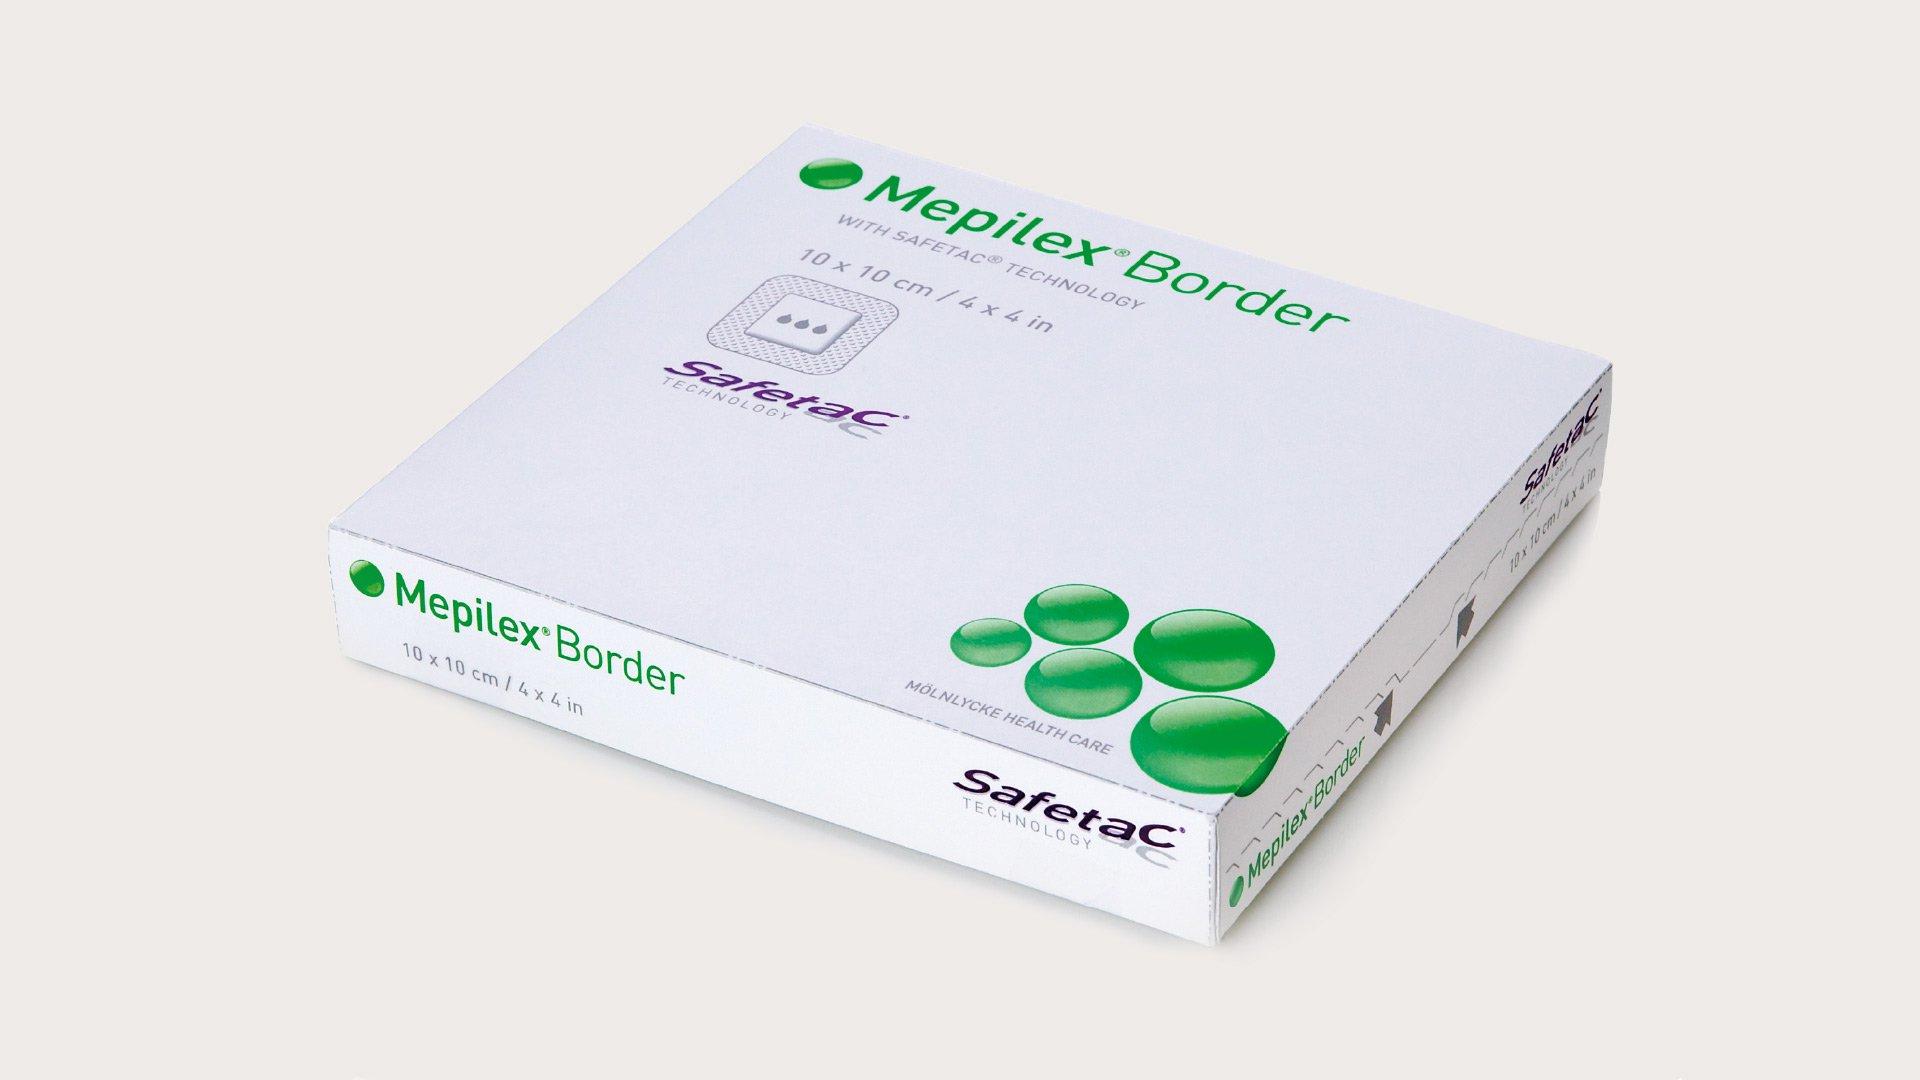 Mepilex Border image